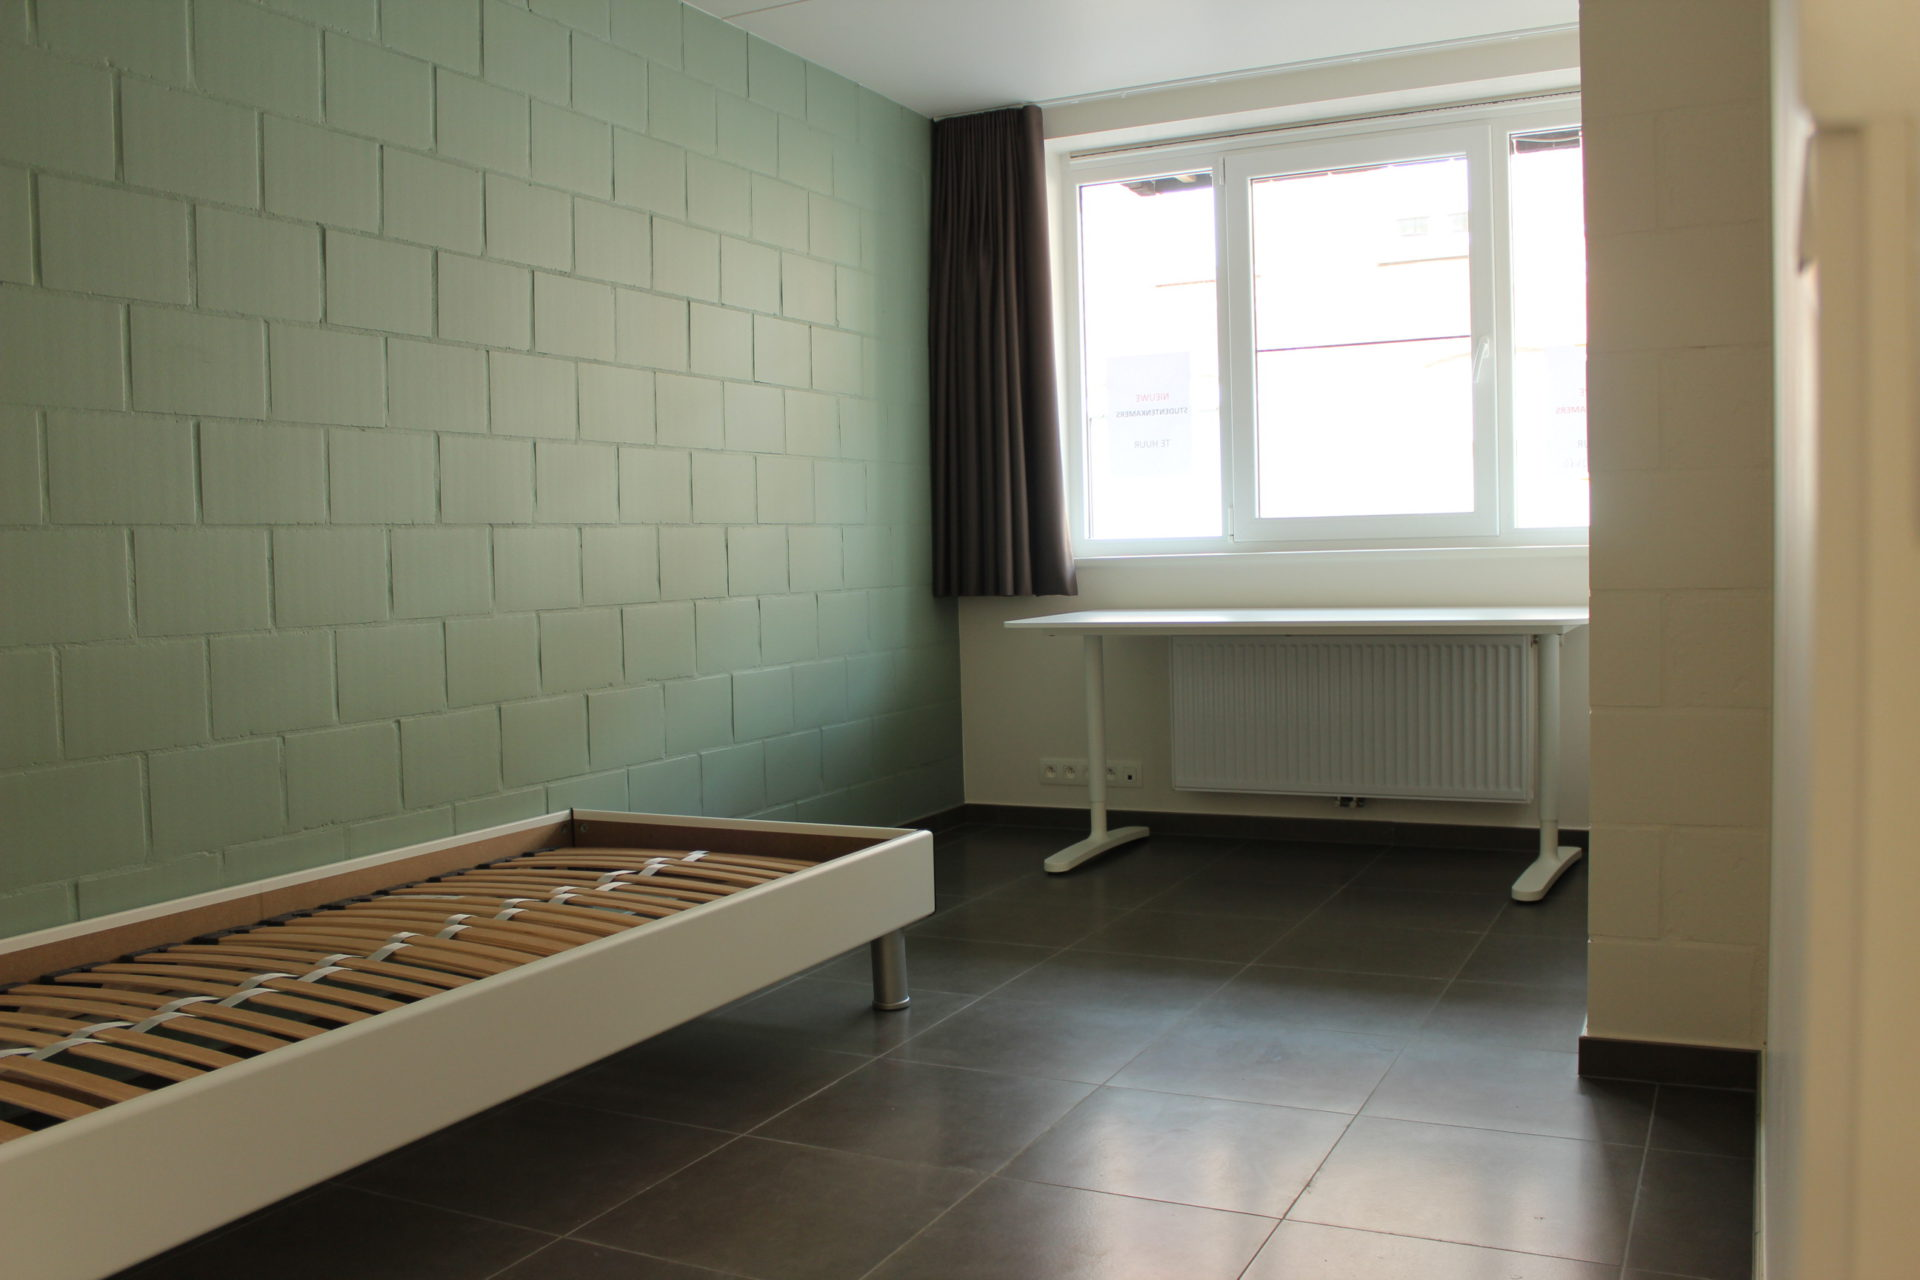 Studentenkamer 260 Maand 16 M² Roeselare Kot 8800